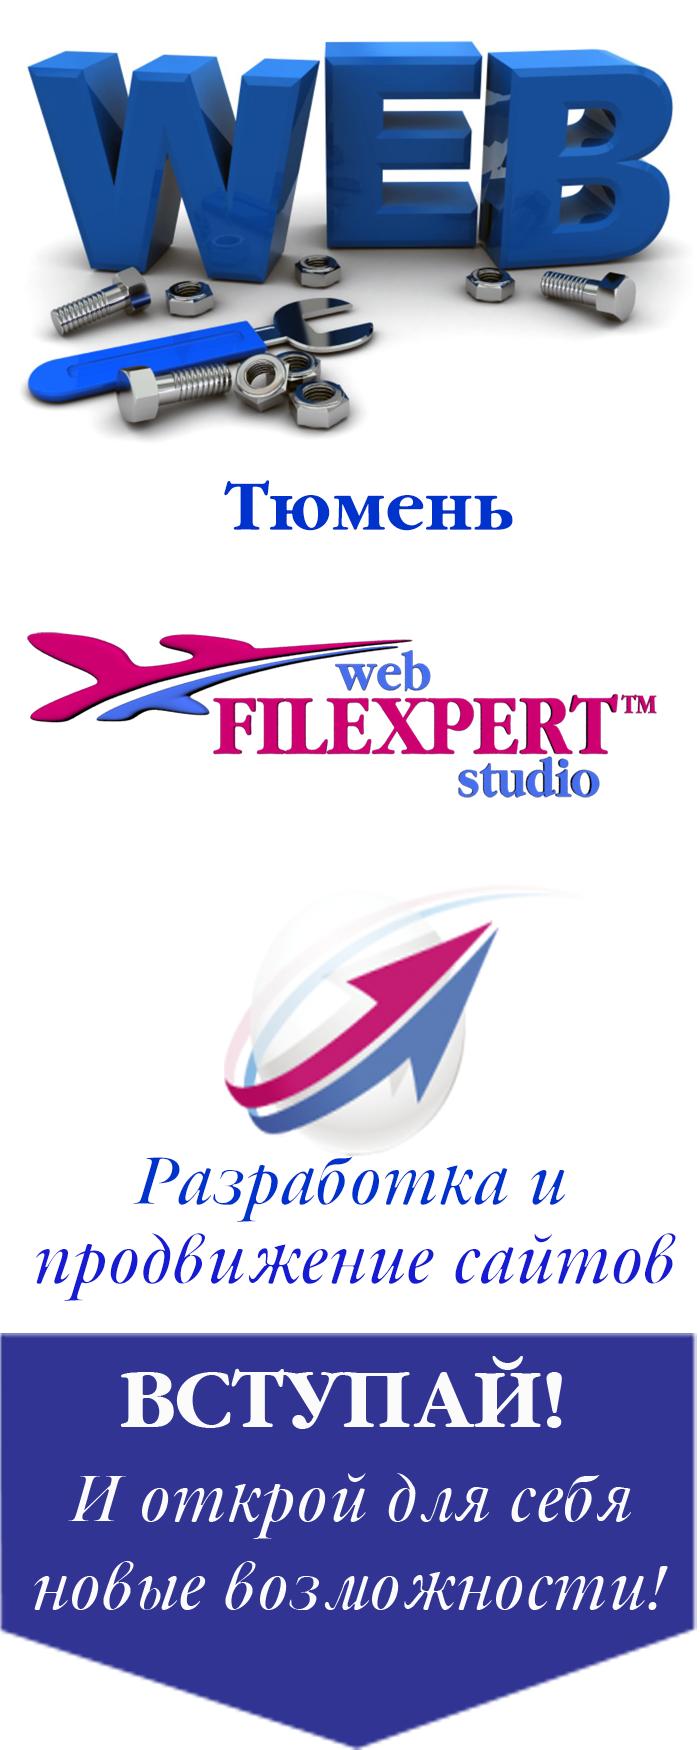 WEB-Студия FILEXPERT™